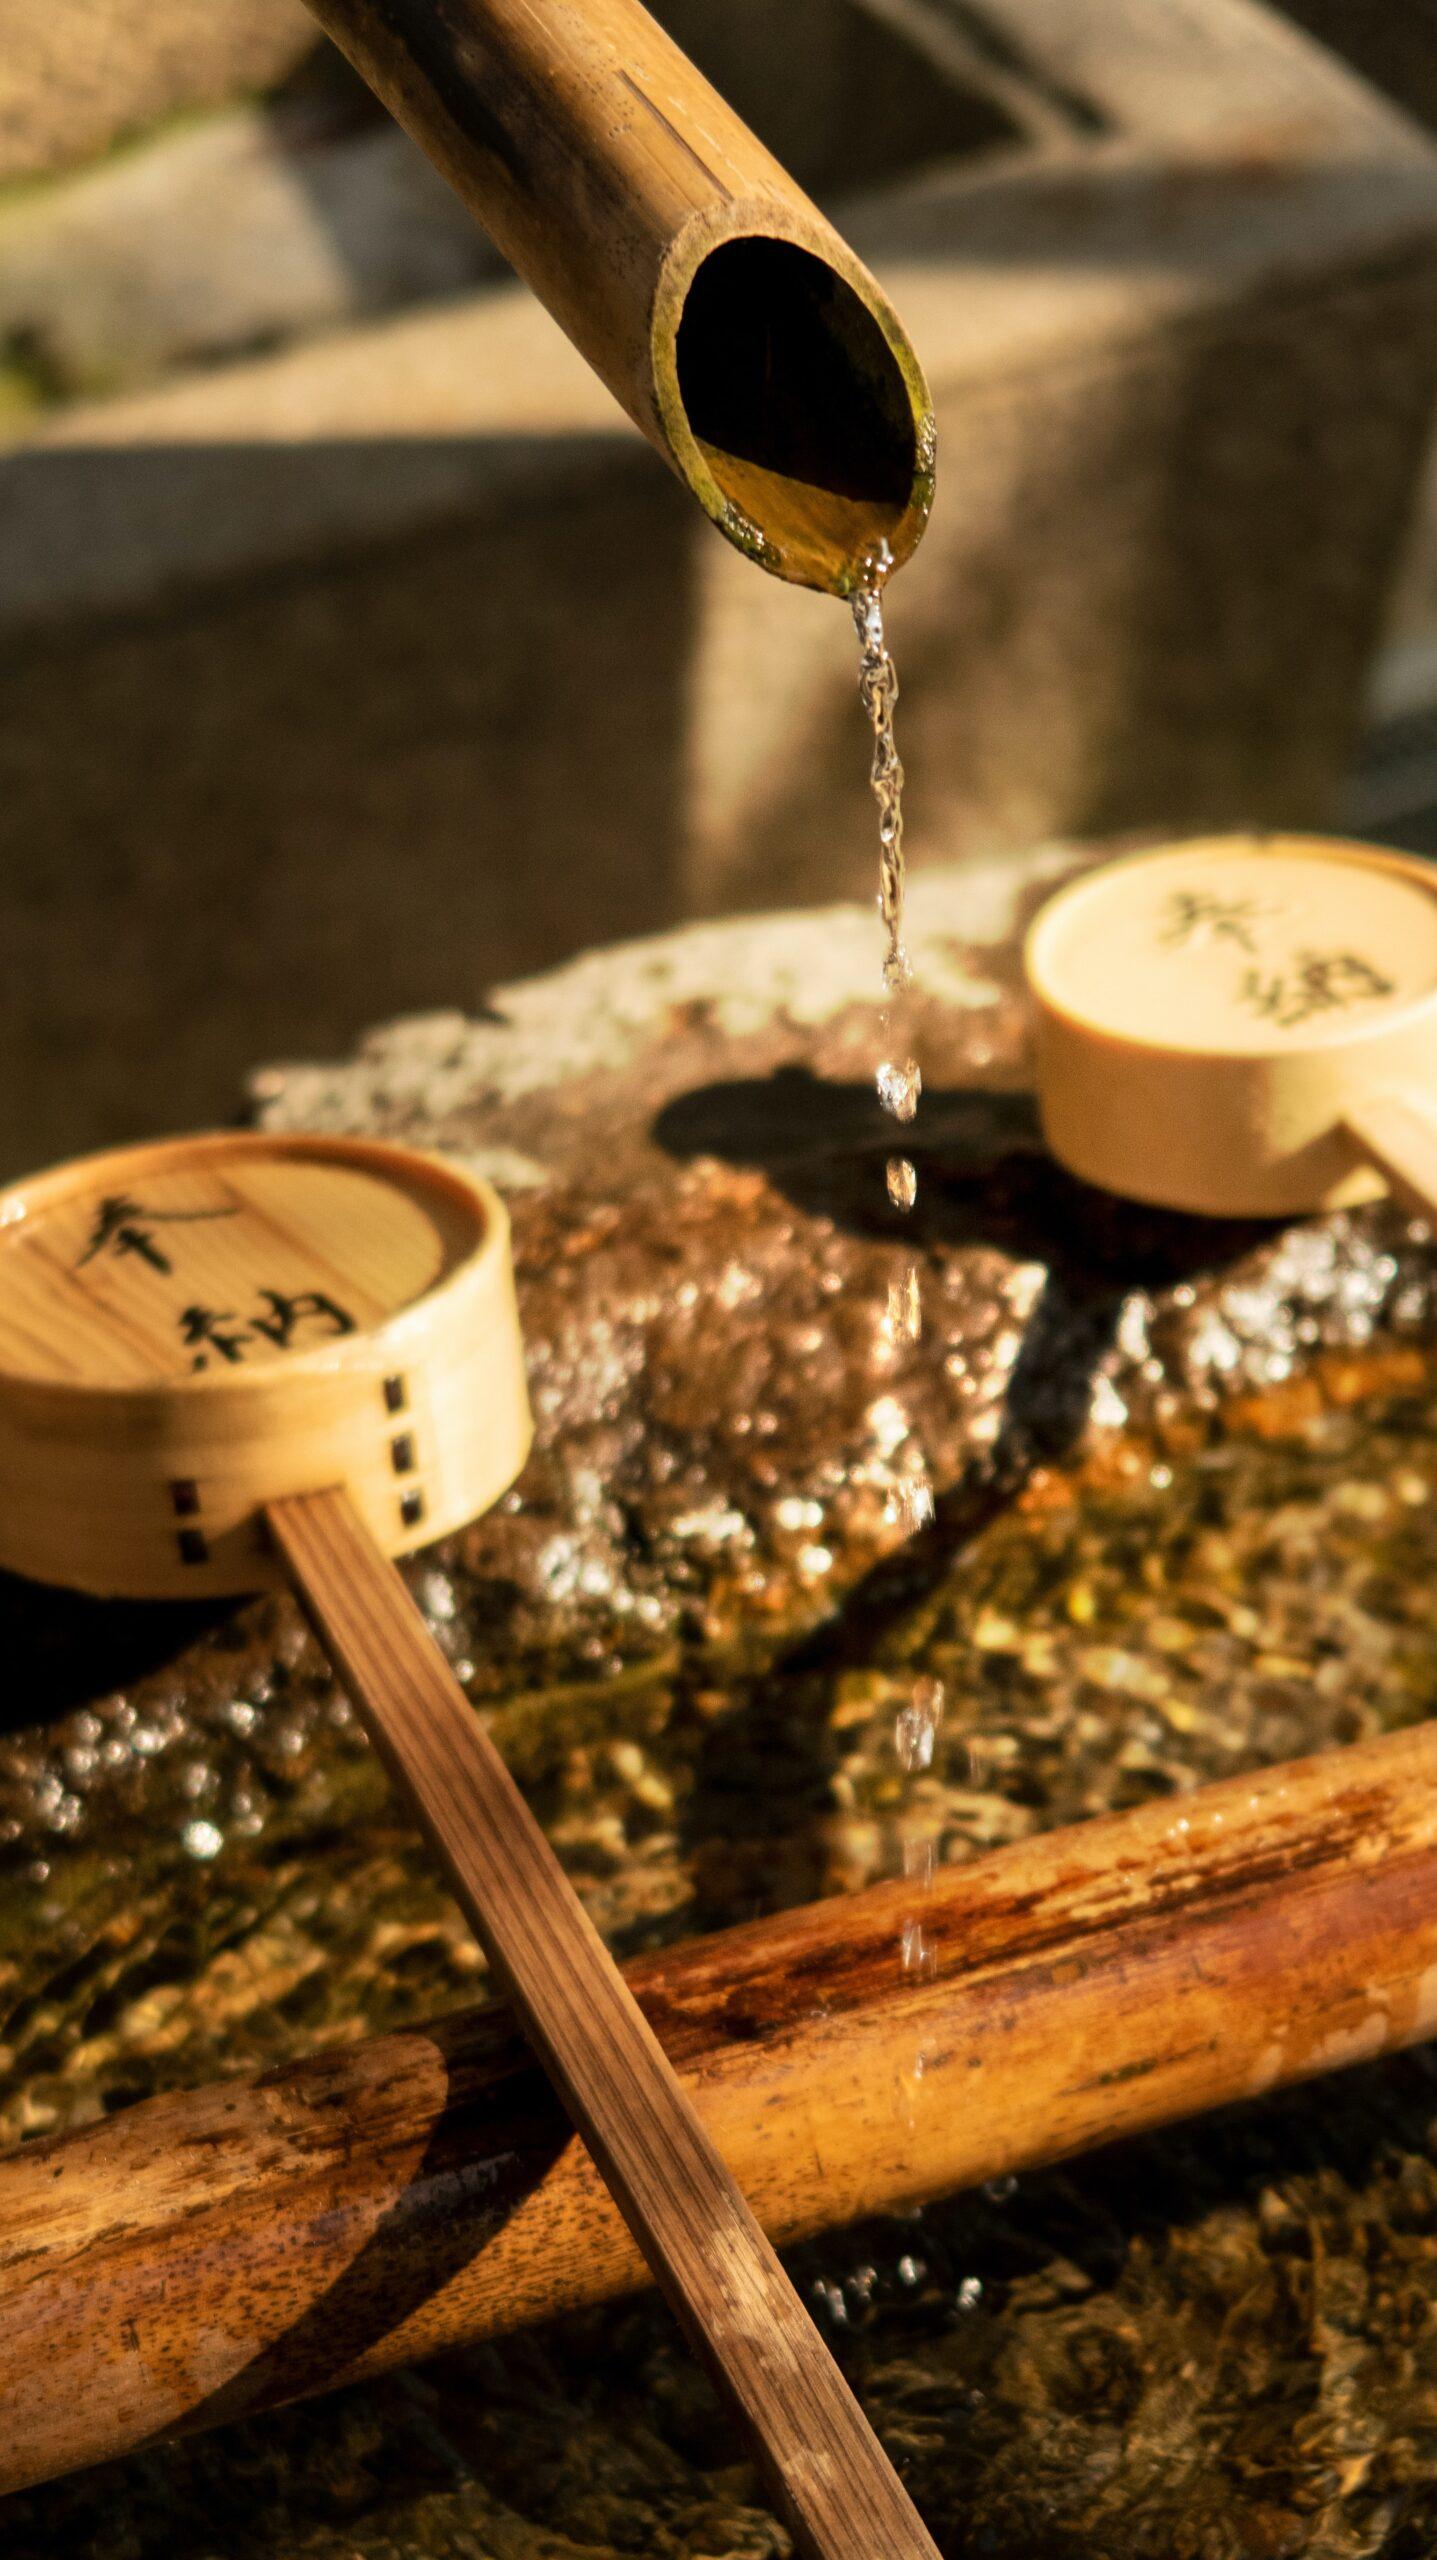 Bamboe alcohol aroma versterken - bamboe weetjes